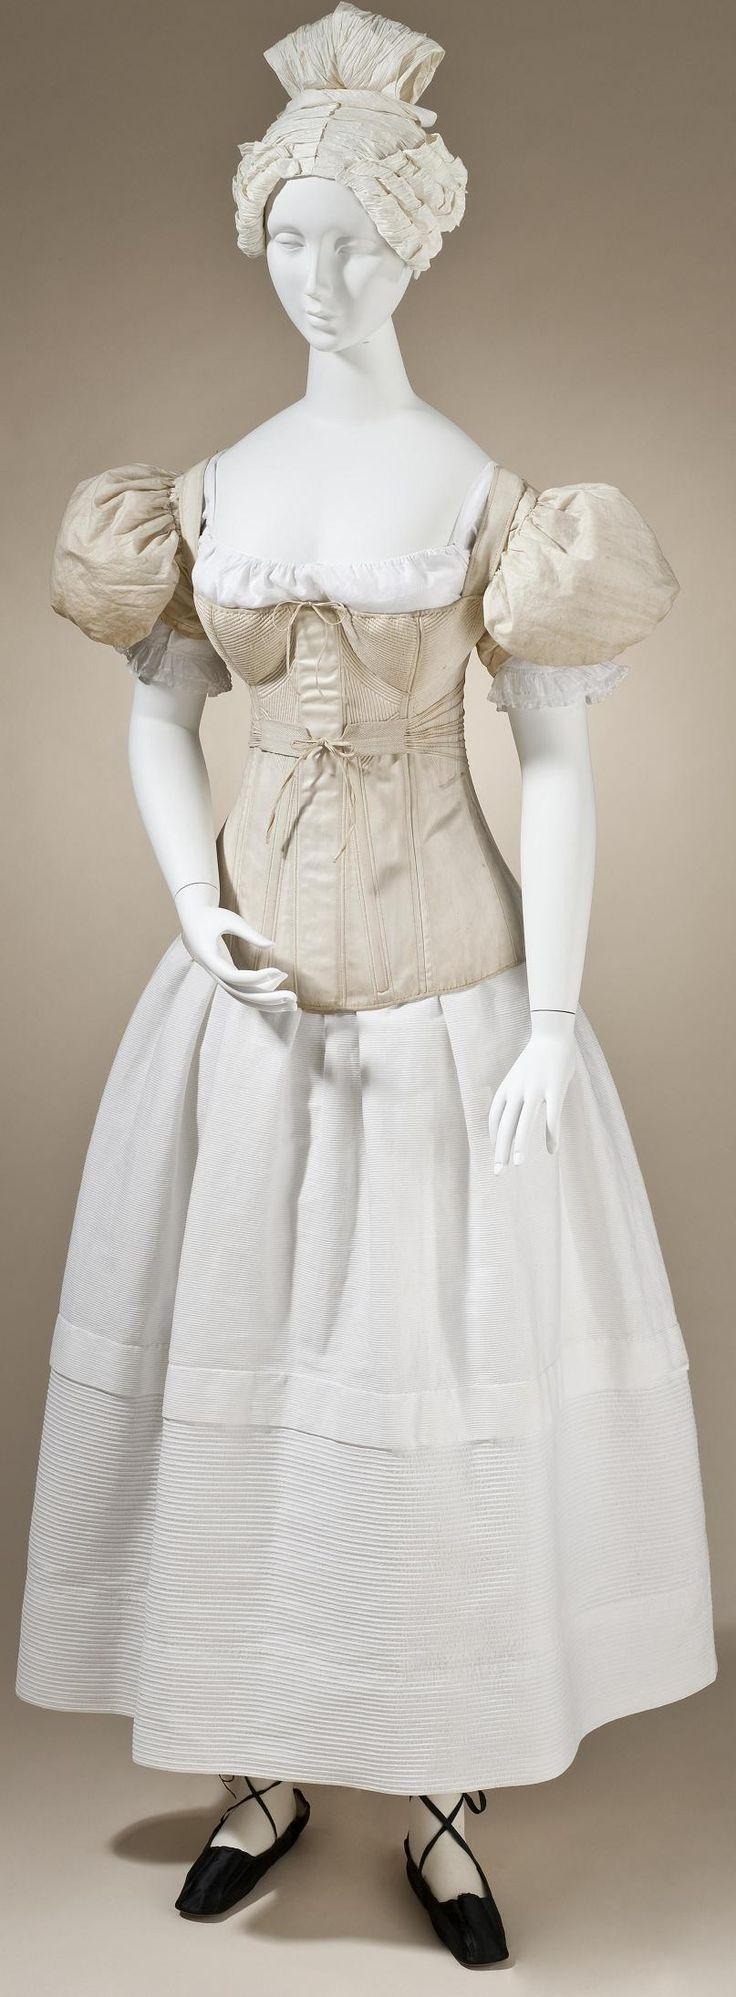 19th century fashion for women 80